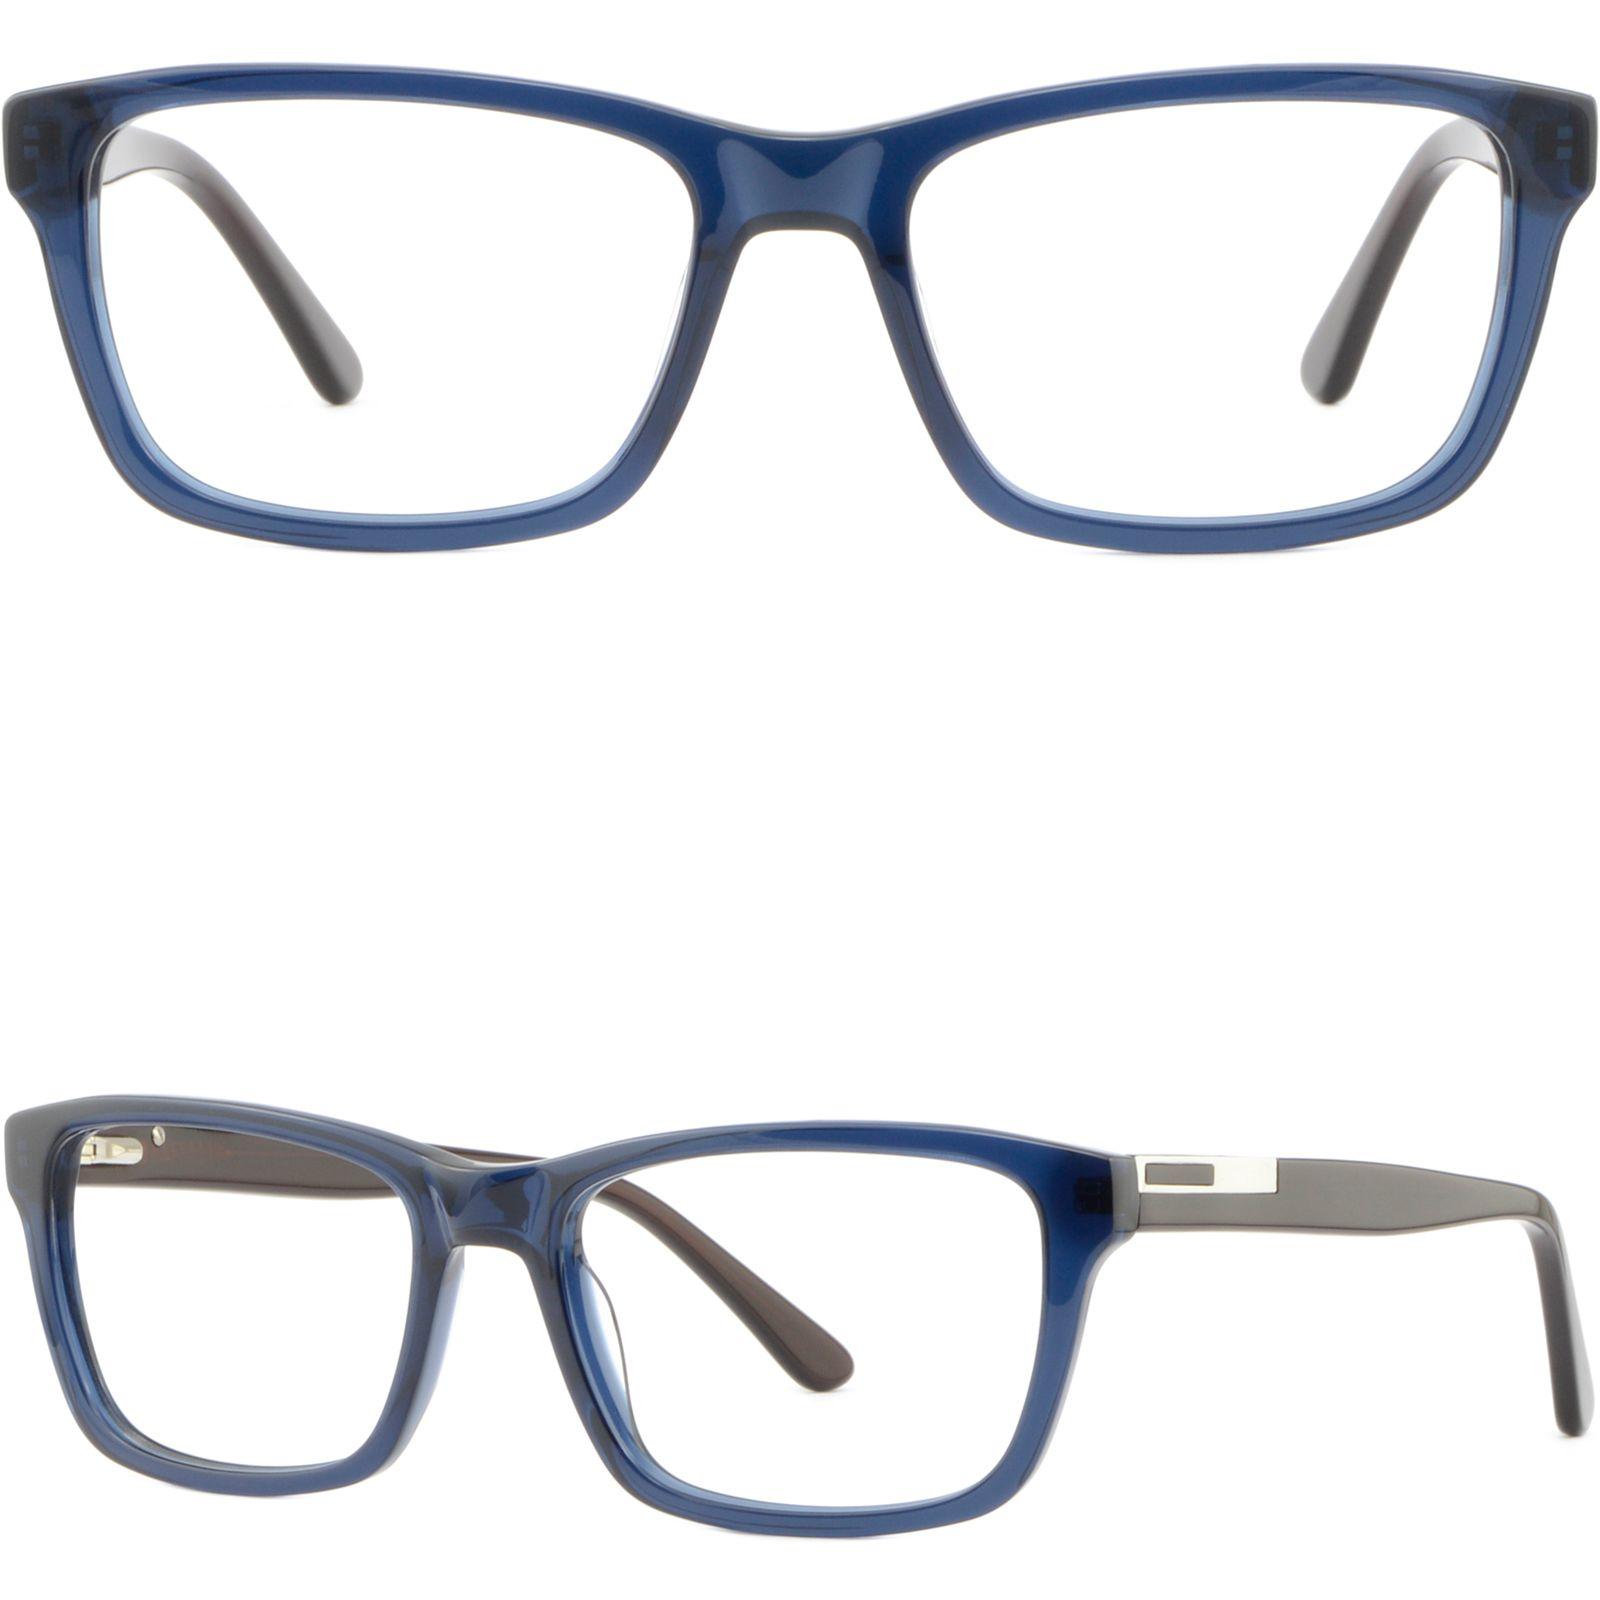 8b13937d9eb Navy Blue Mens Womens Plastic Frame Spring Hinges Rectangle Prescription  Glasses Glasses Frame Online with  28.69 Piece on Aceglasses s Store